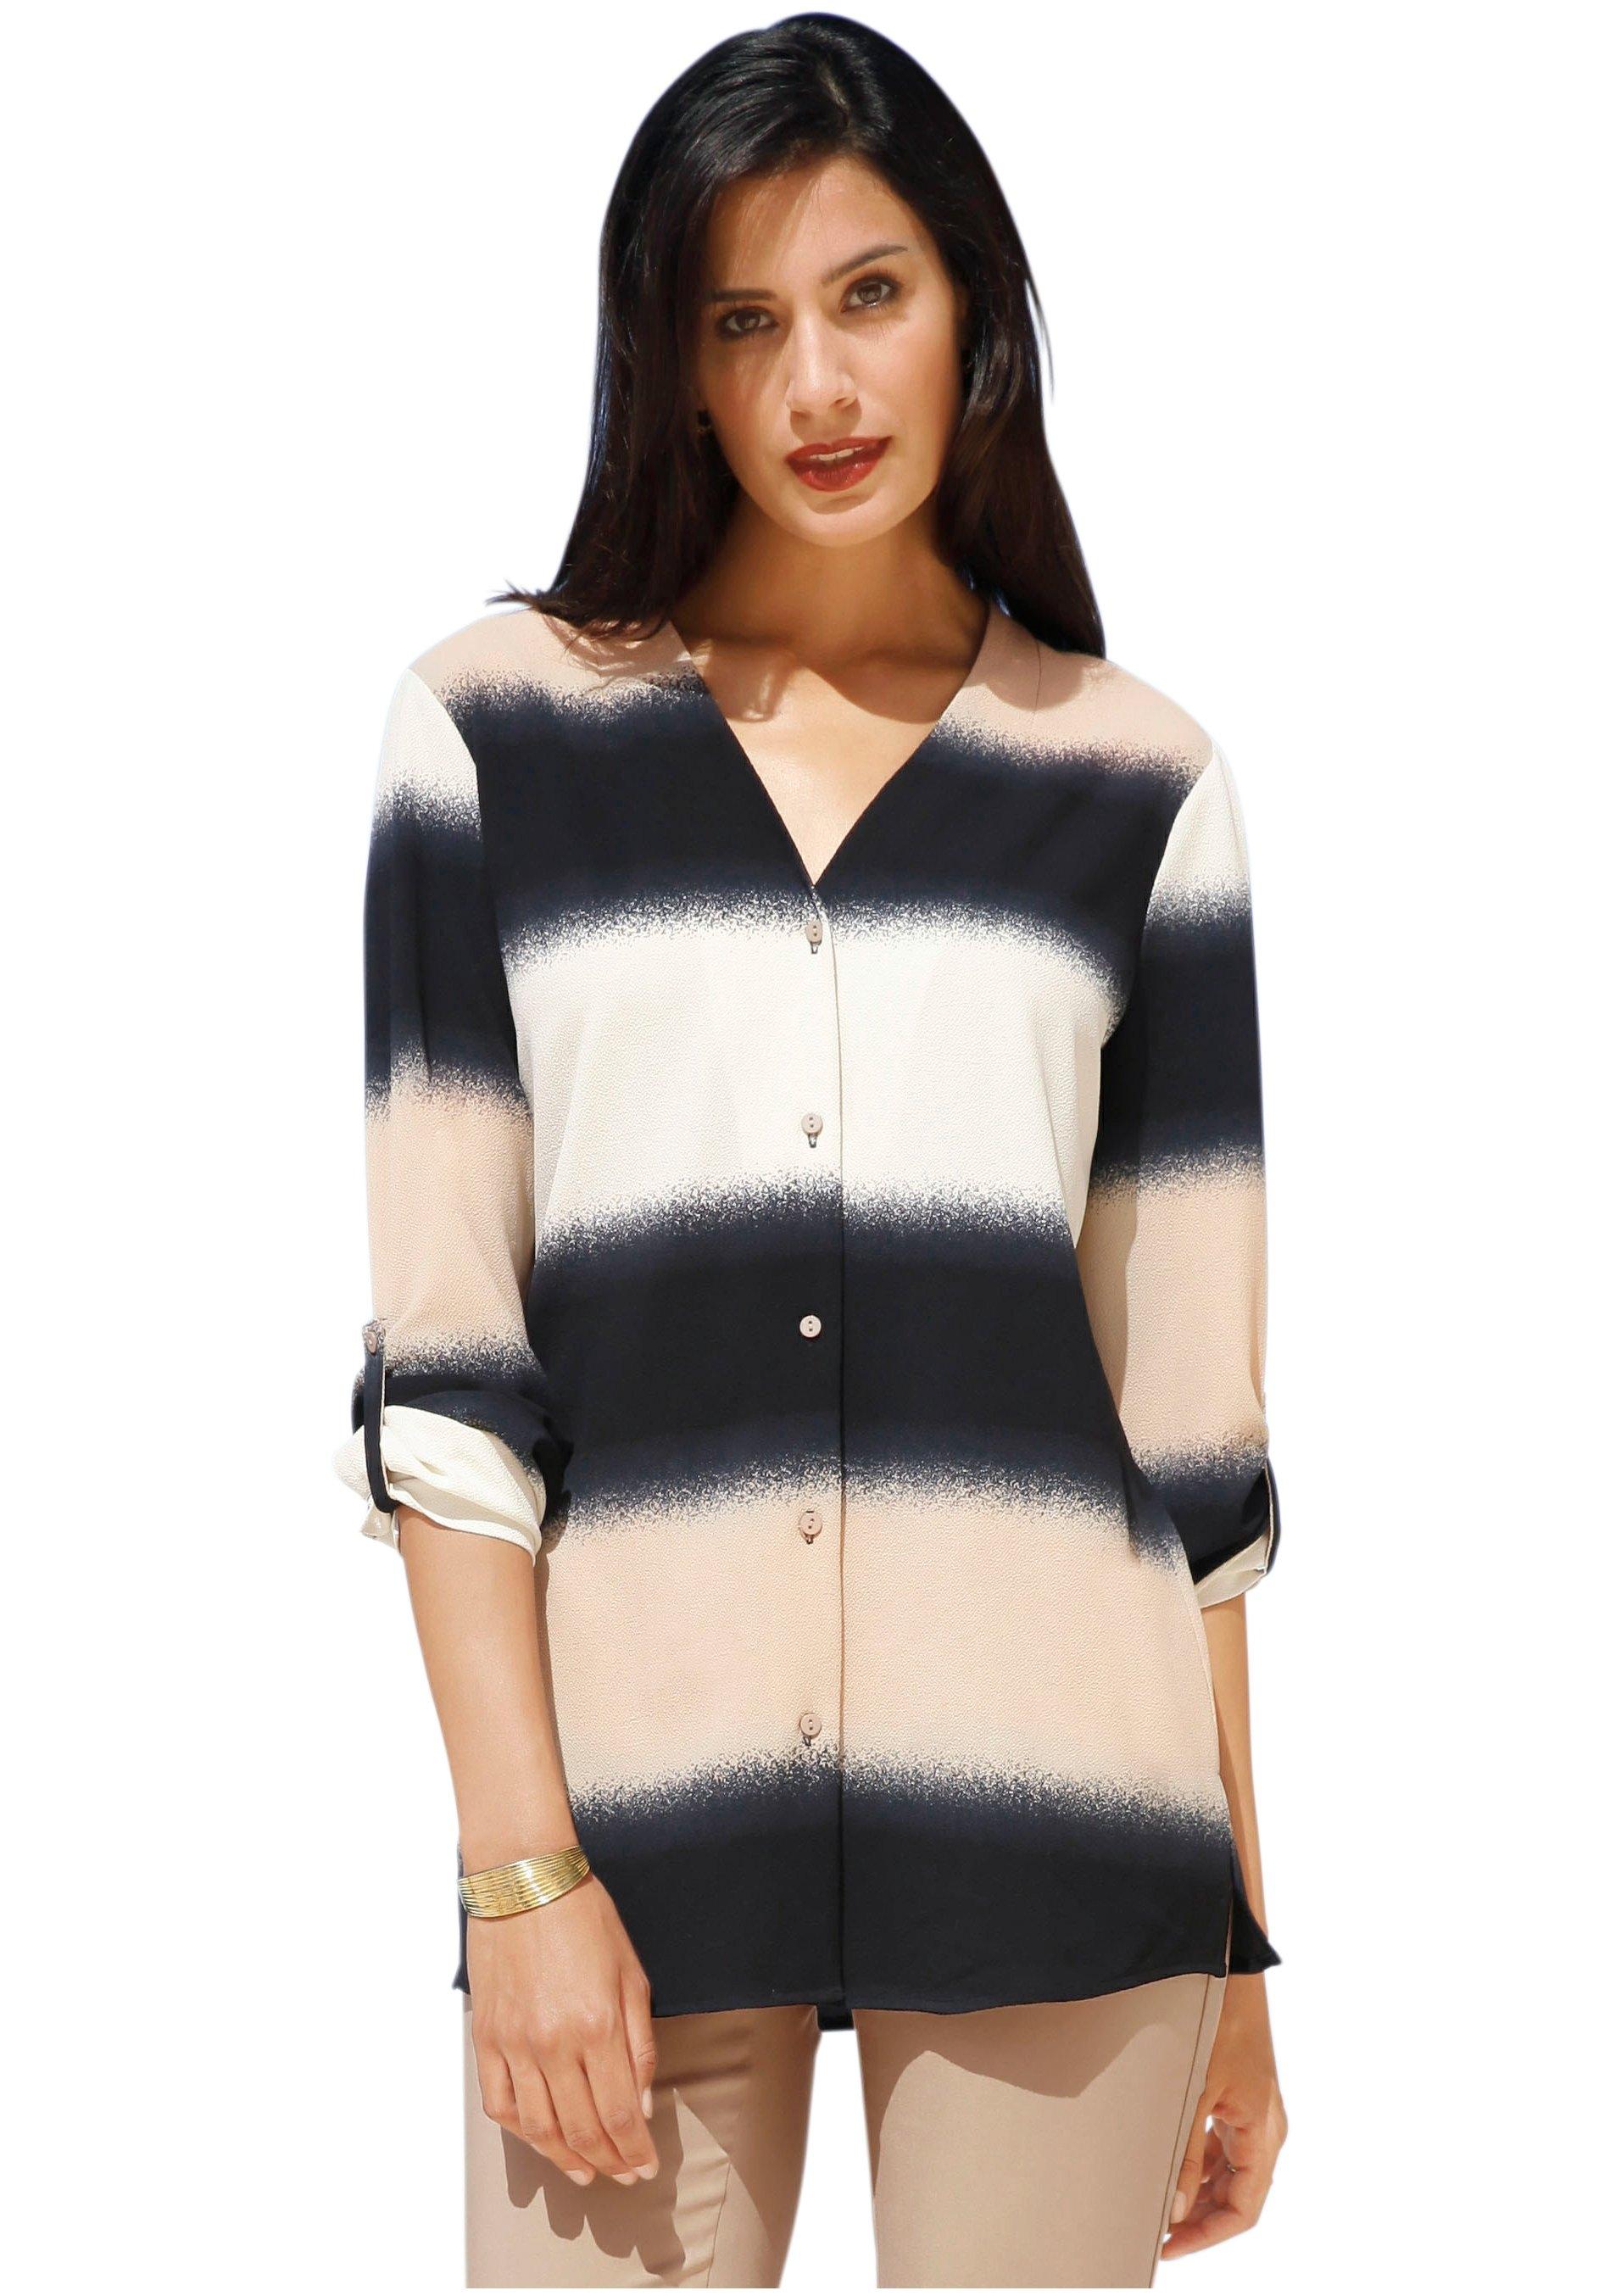 creation L Création L lange blouse met »sprayed«-effect bestellen: 30 dagen bedenktijd